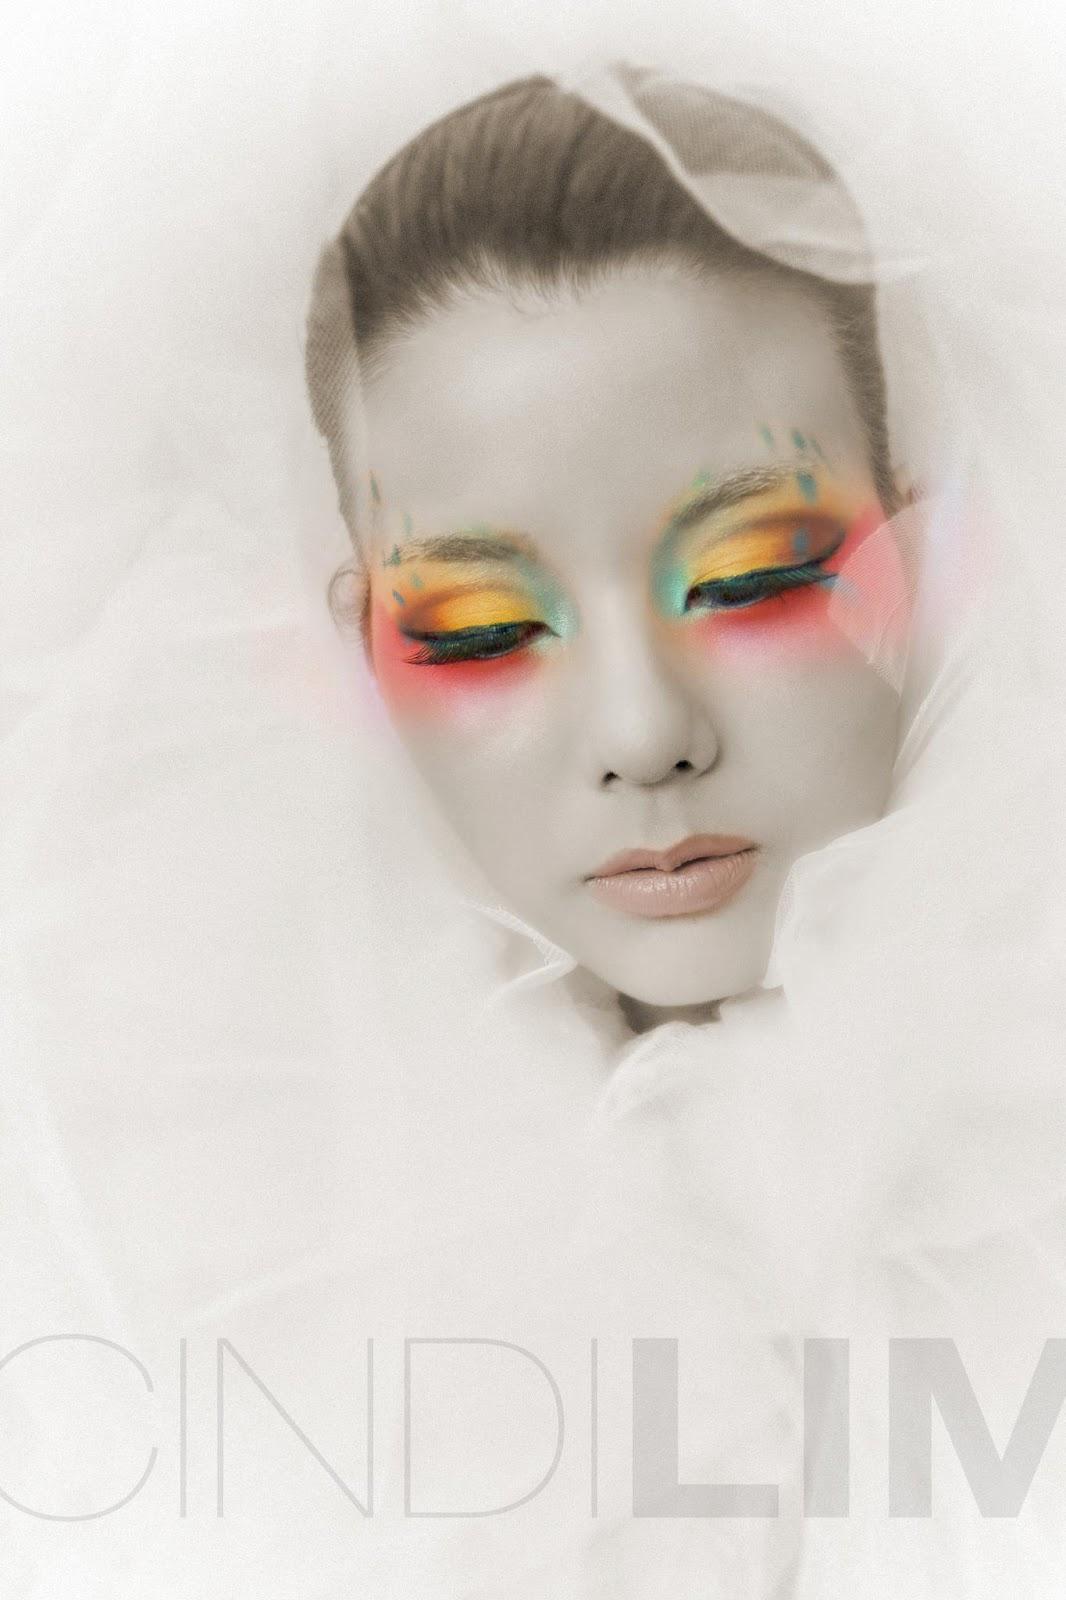 Cindi Pro Makeup Artist Commercial Photoshoot Makeup: :: Cindi Pro. Makeup Artist ::: 2012